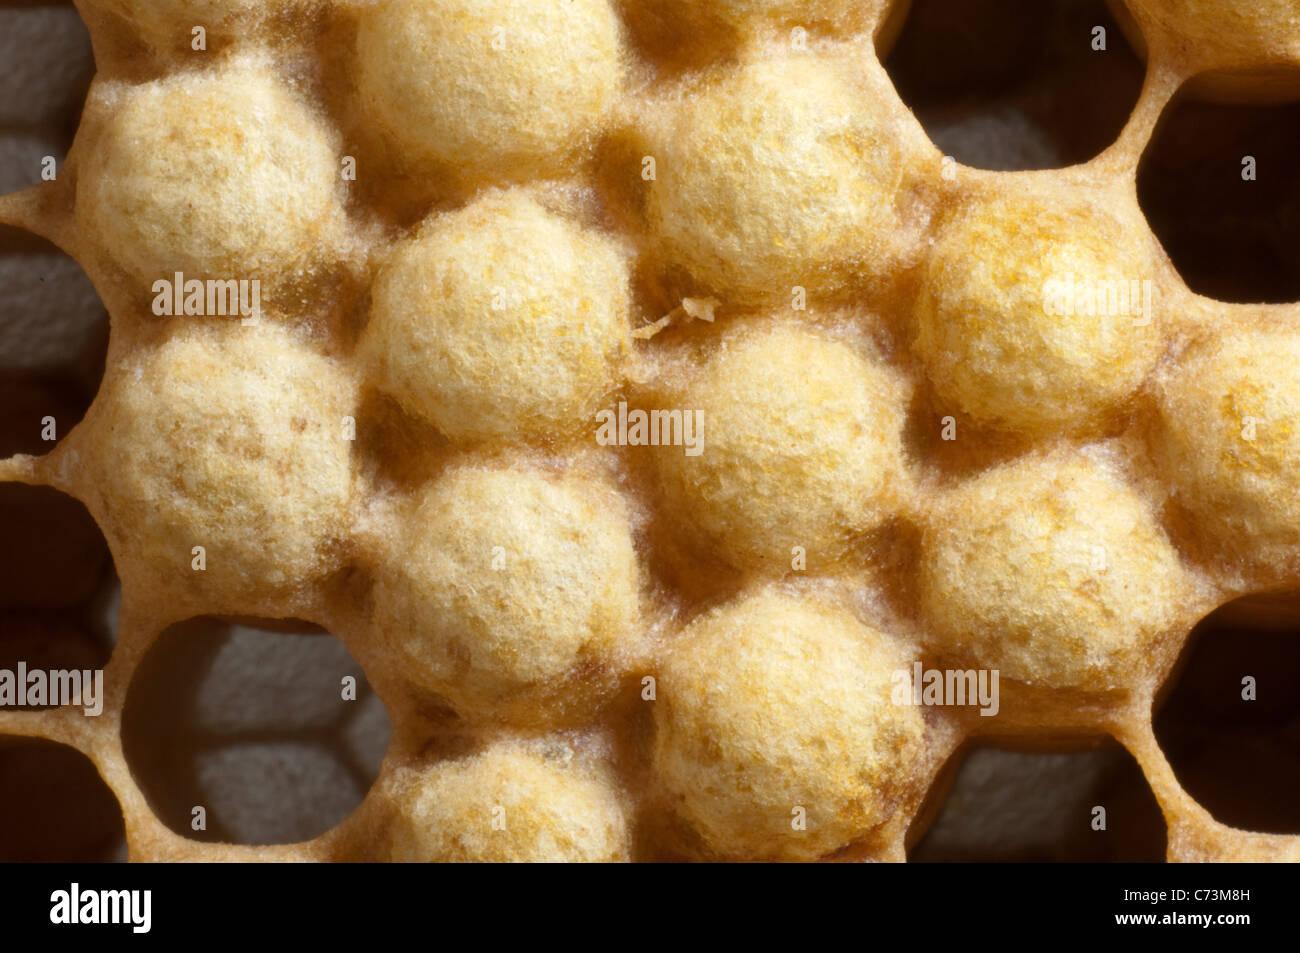 European Honey Bee, Western Honey Bee (Apis mellifera, Apis mellifica). Close-up of closed cells of drones. - Stock Image